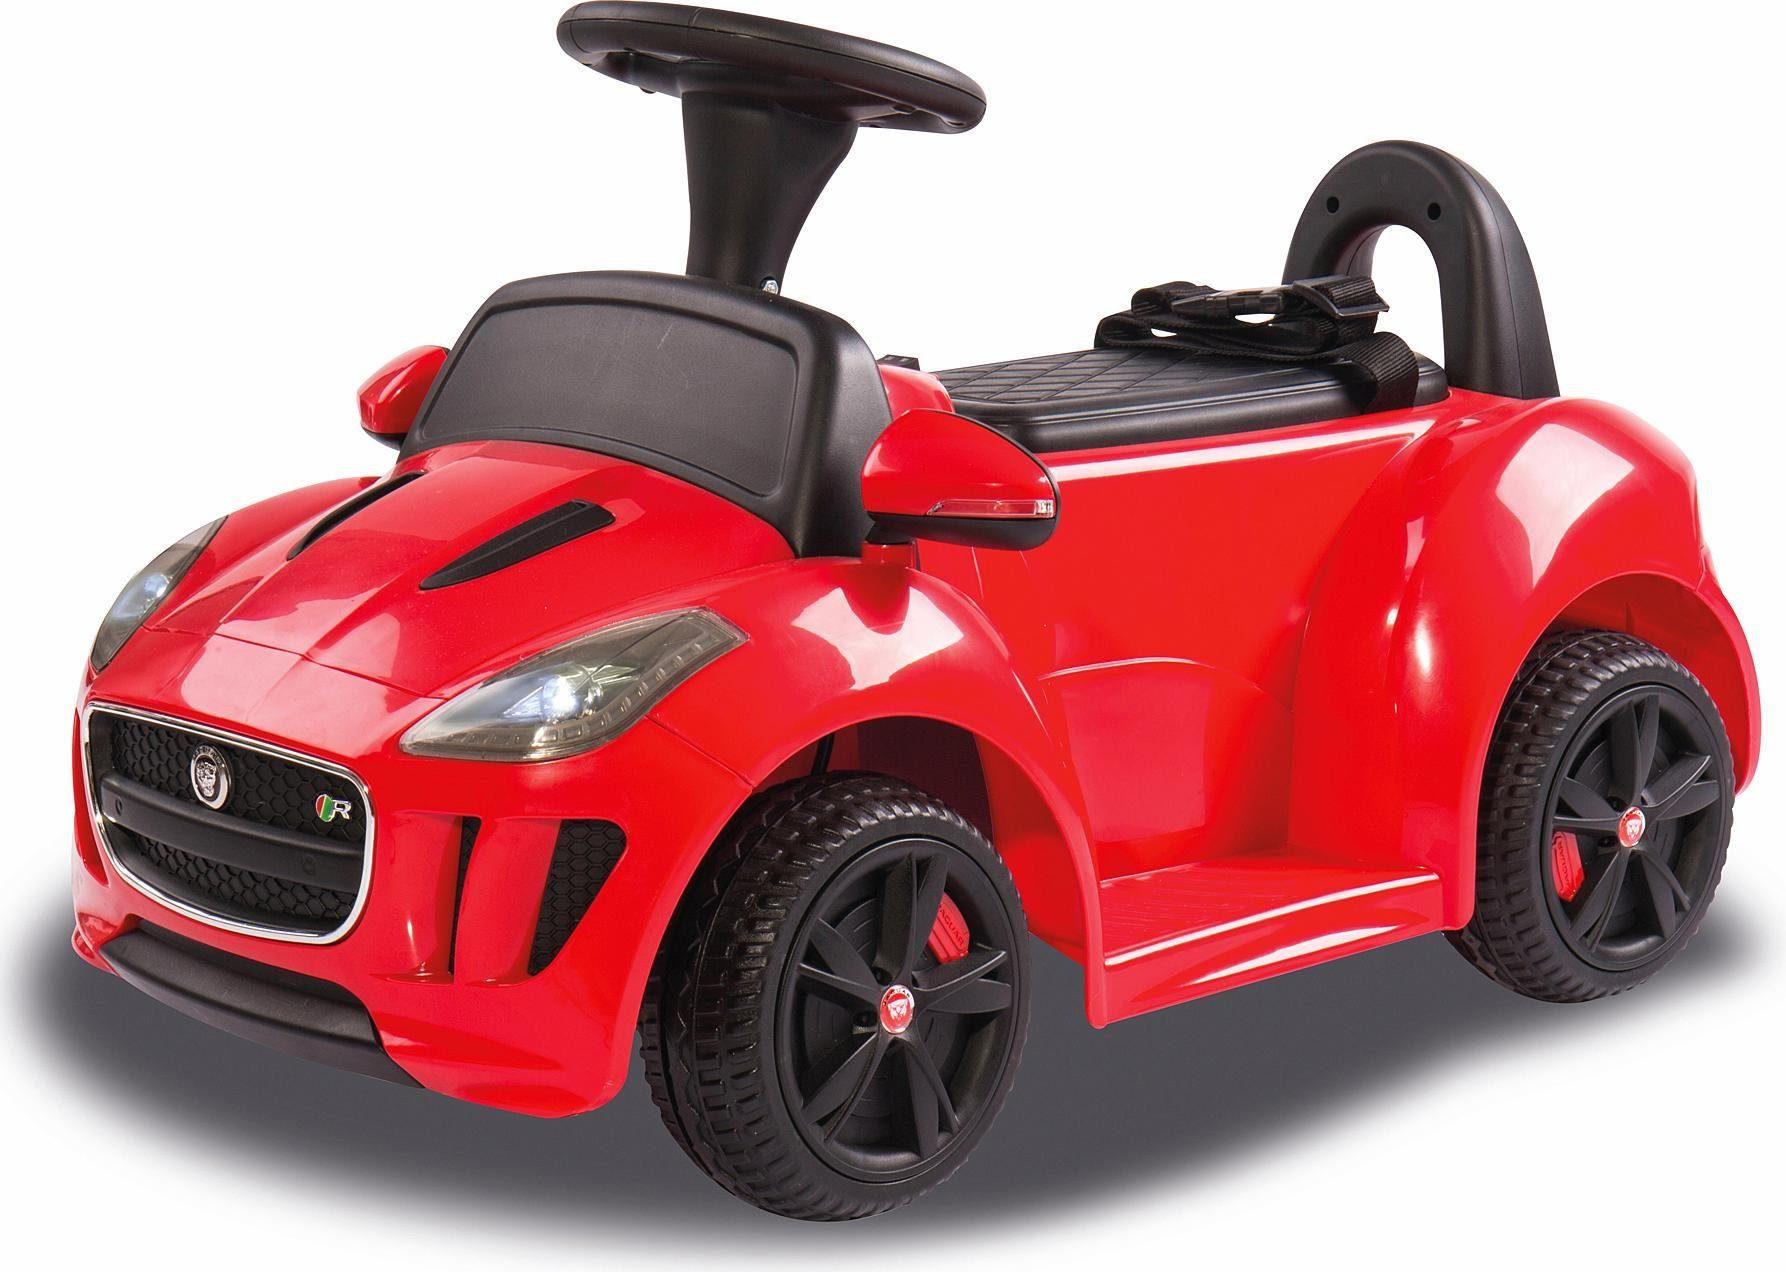 JAMARA Elektrofahrzeug für Kinder, »JAMARA KIDS Ride On Jaguar rot 6V«